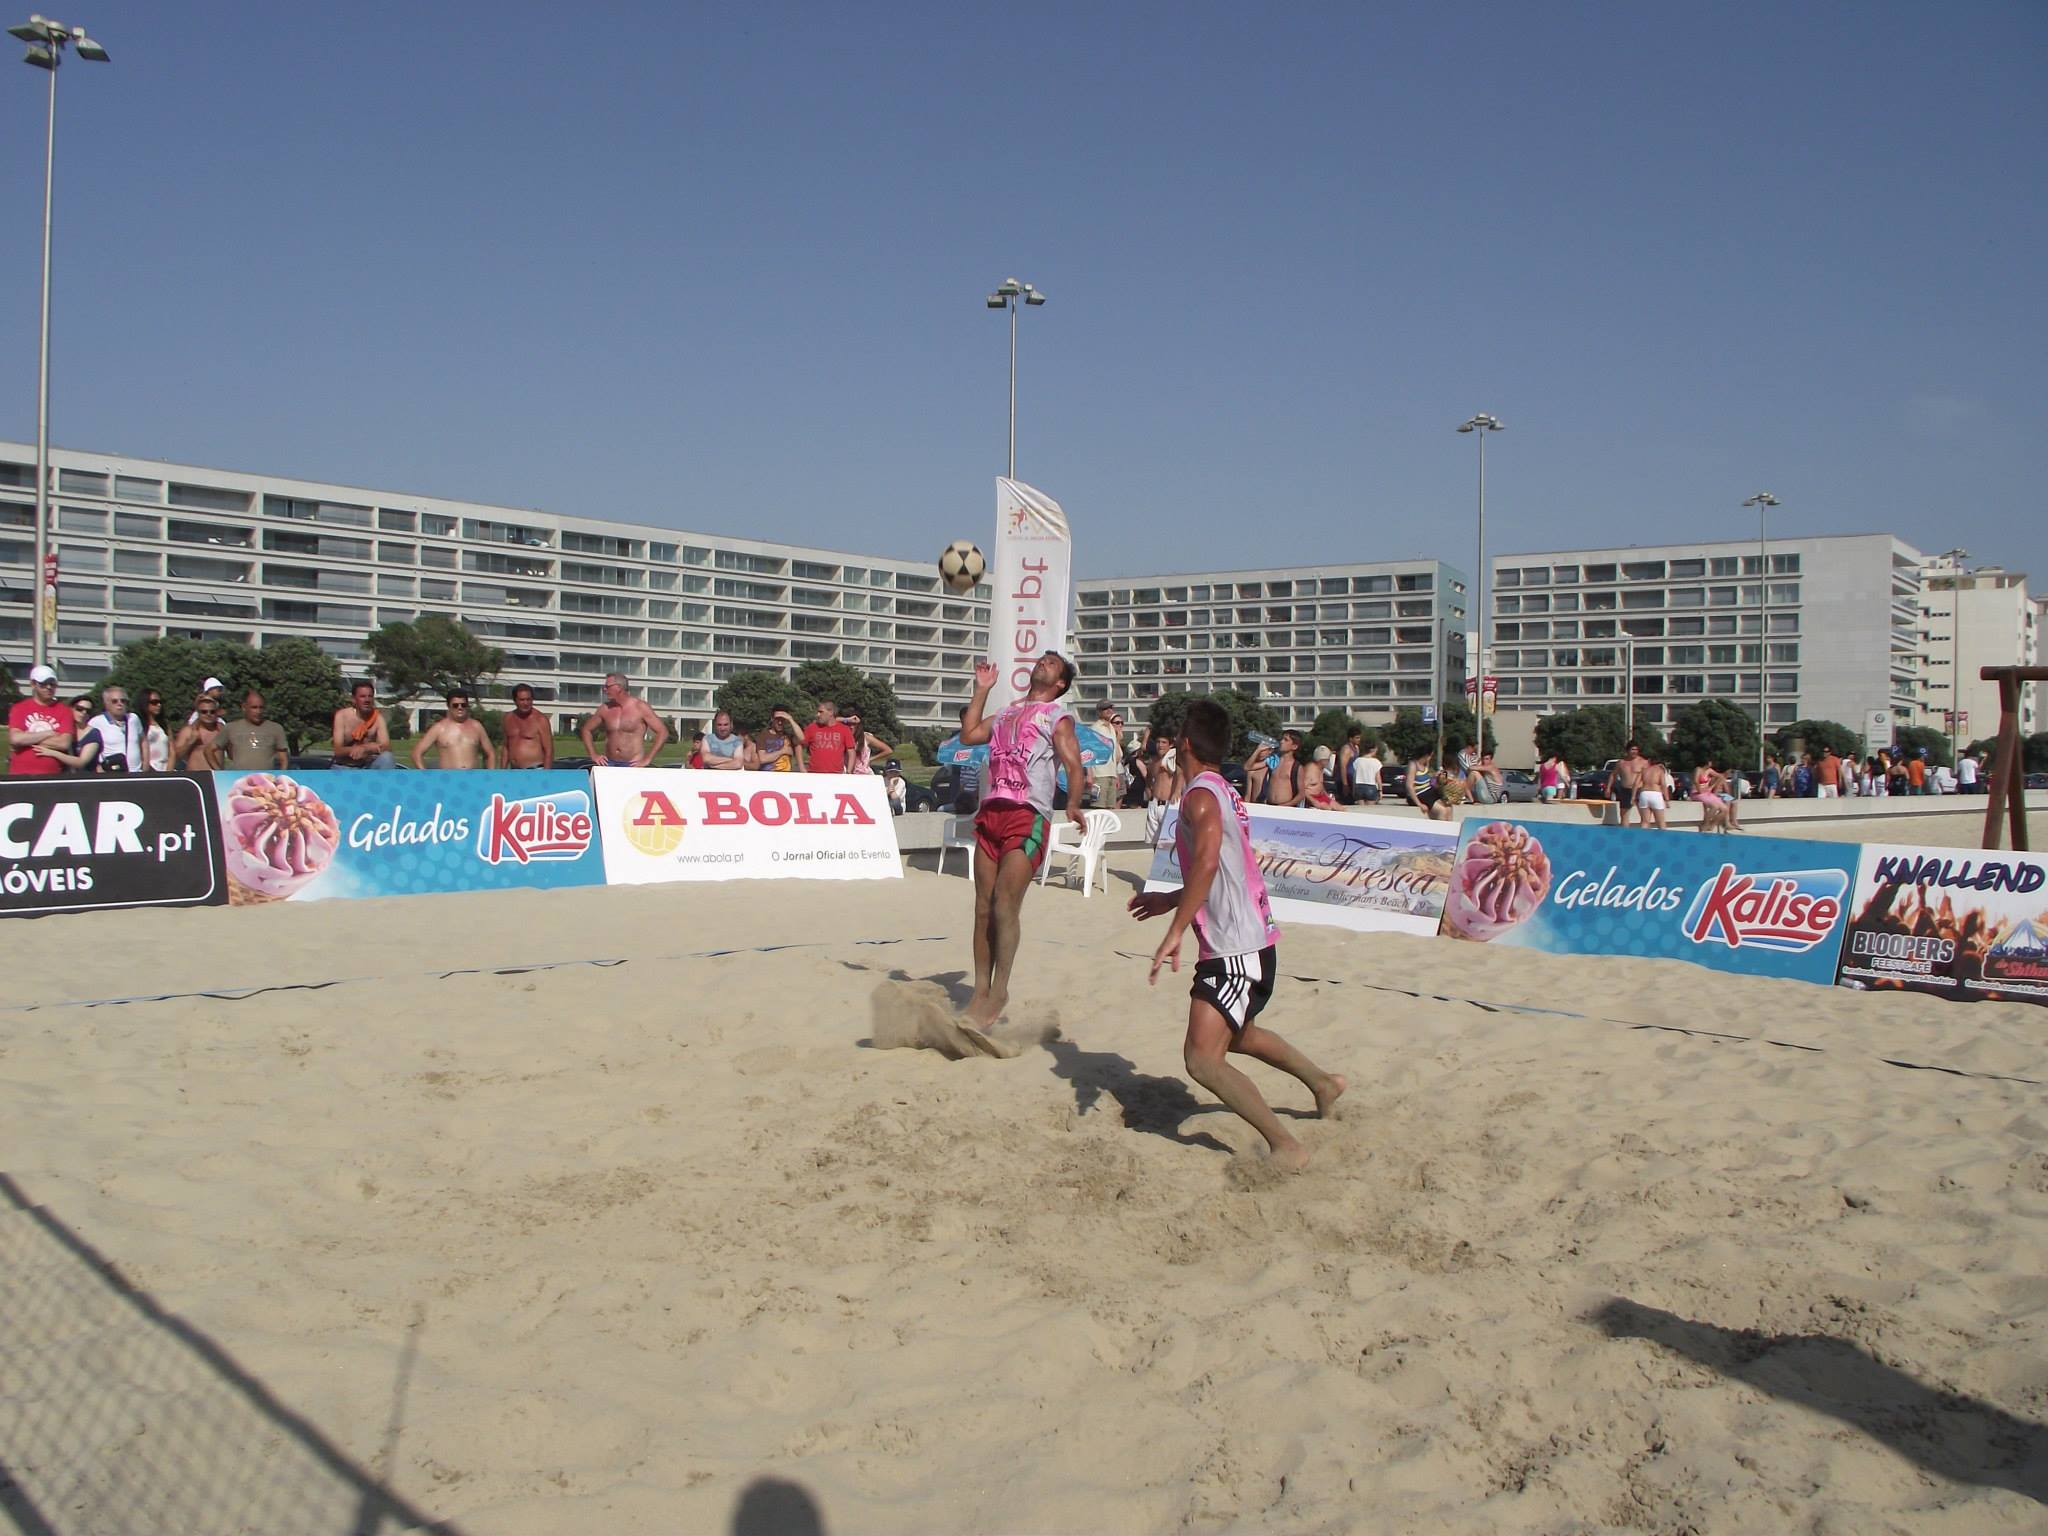 2nd stage - National Footvolley Championship 2013 - Matosinhos